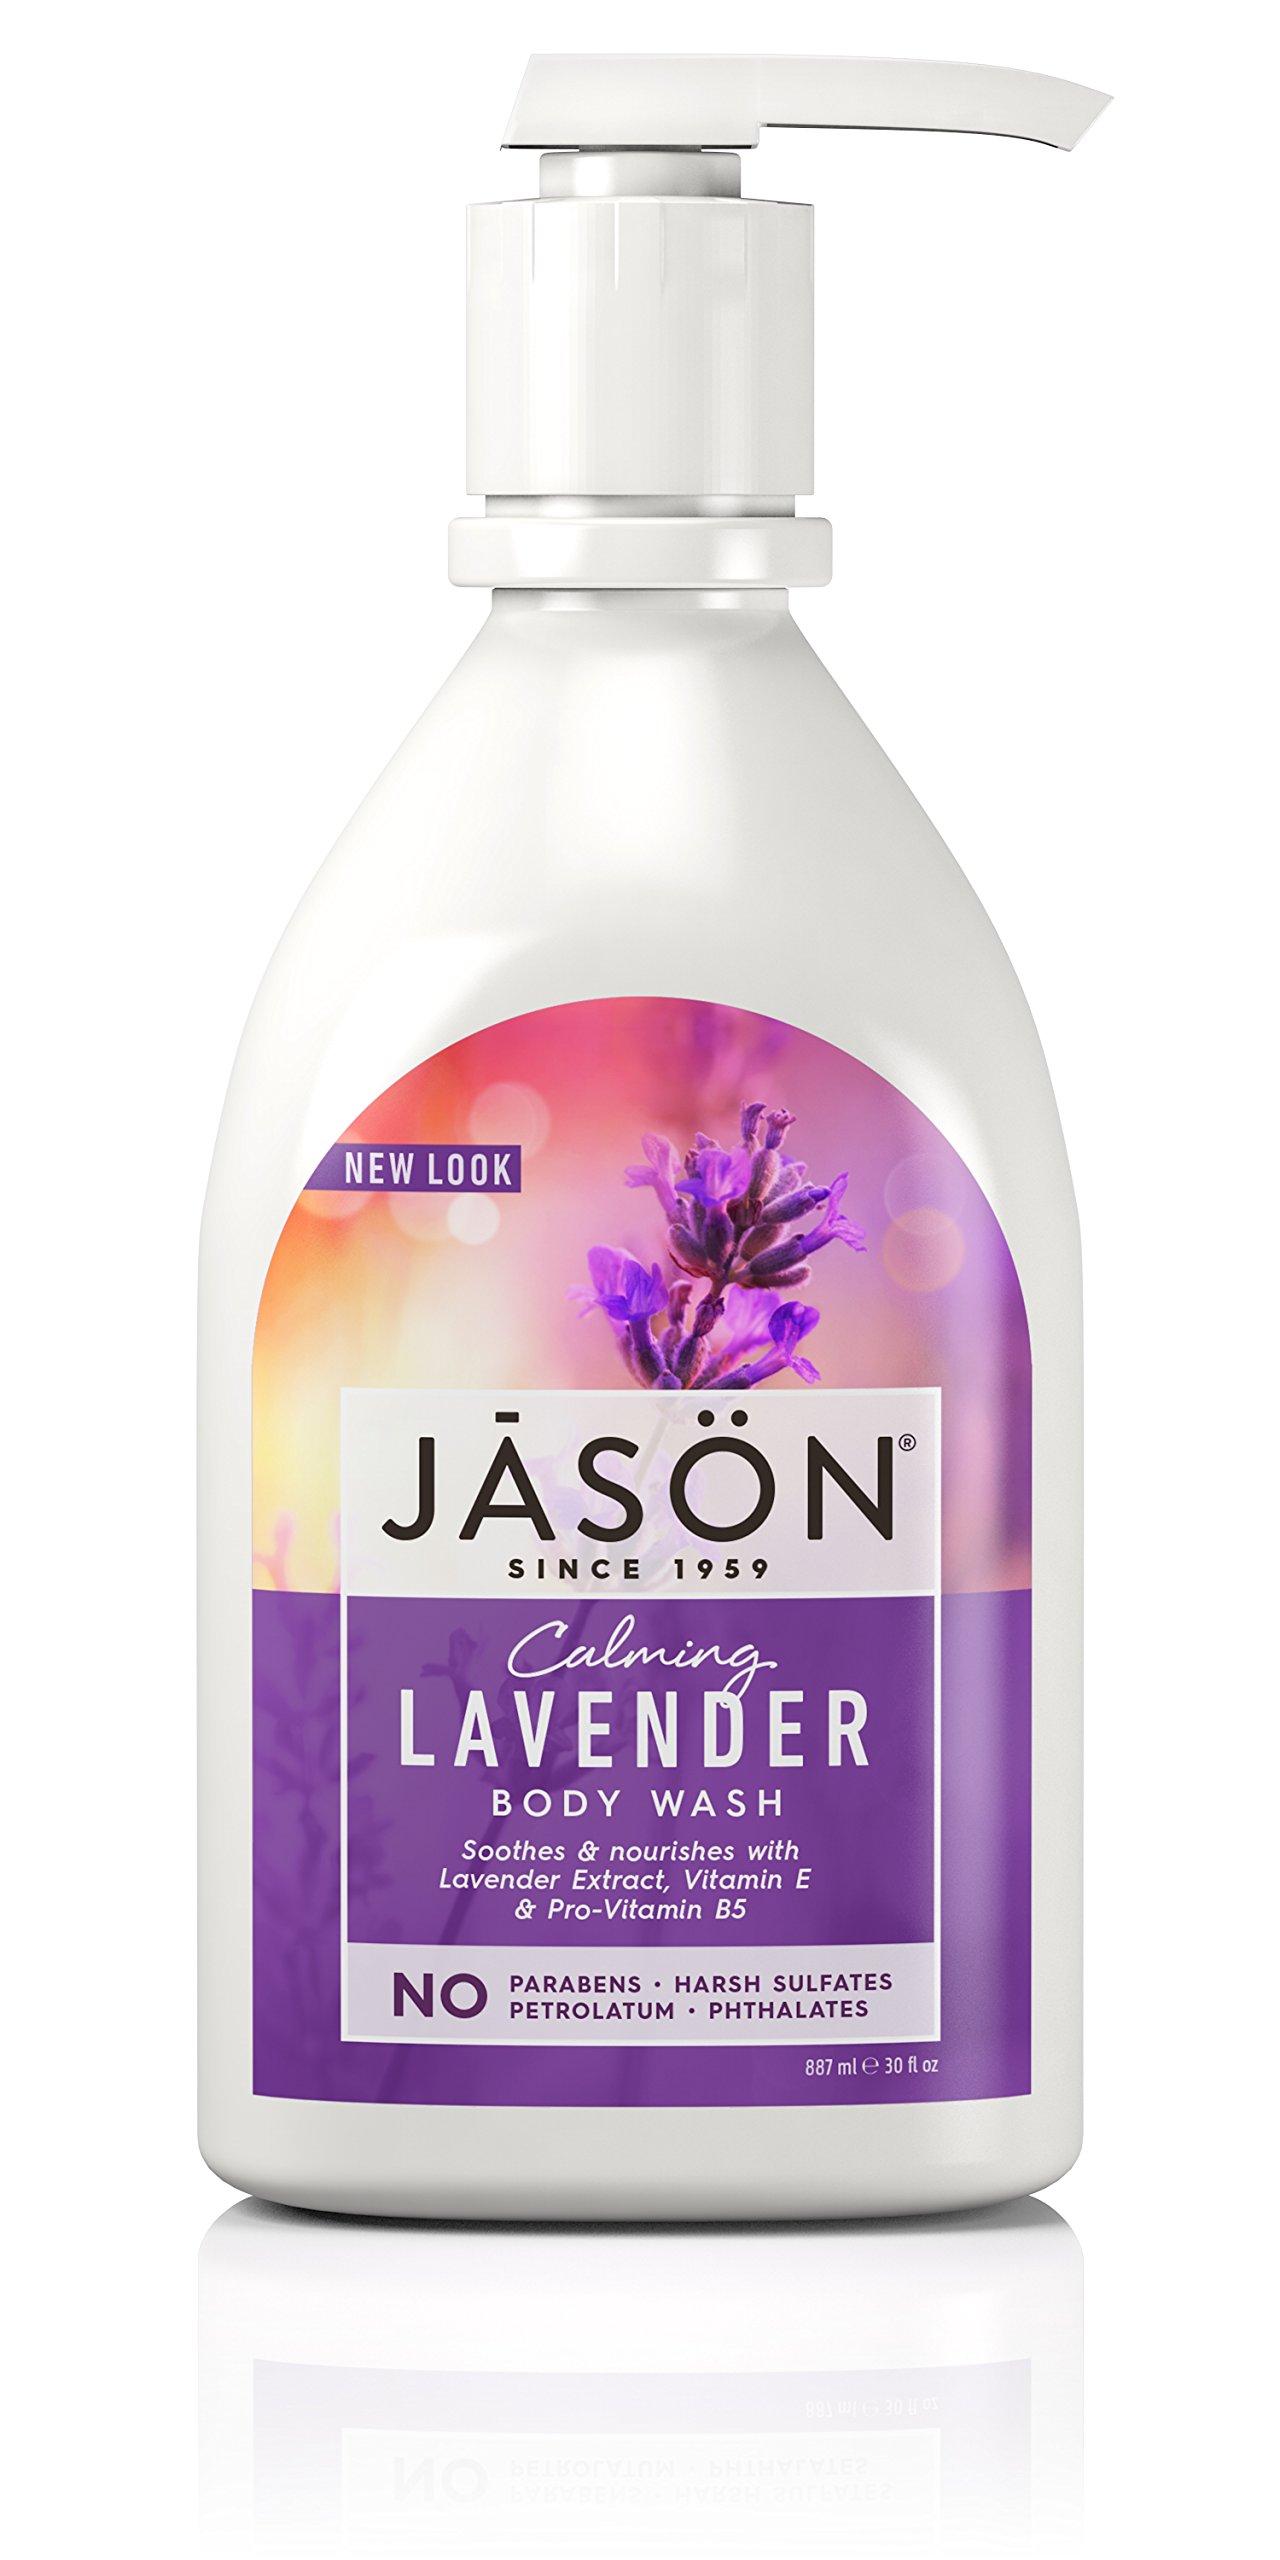 JASON Lavender Body Wash, 30 Oz (Packaging May Vary)